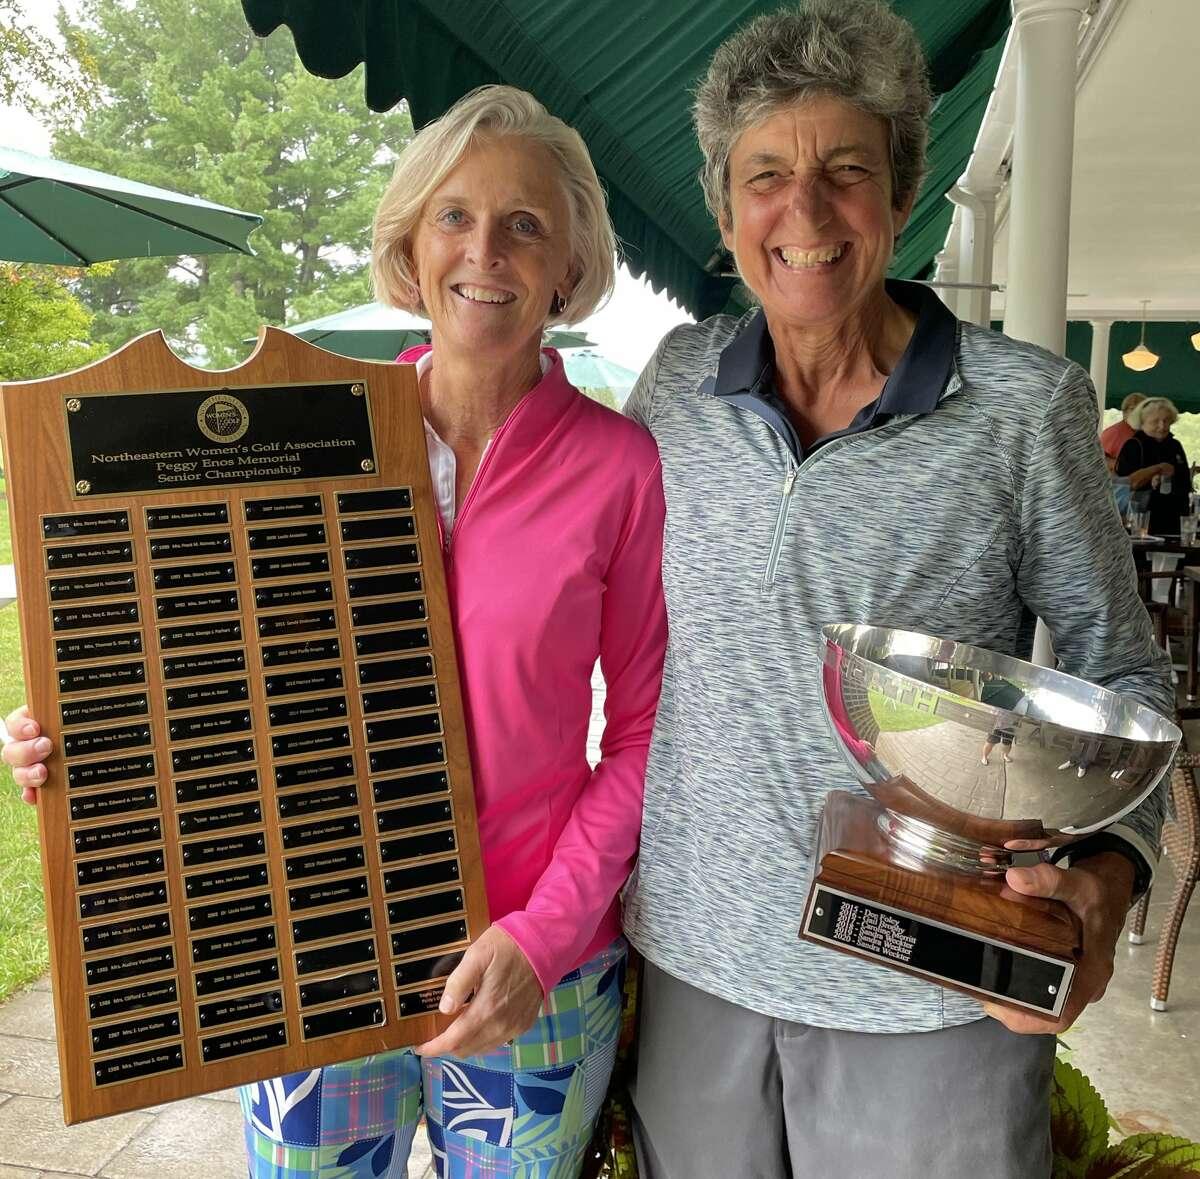 Northeastern Women's Golf Association winners Susan Kahler of Ballston Spa and Linda Kolnick of Canajoharie. Kahler won the Peggy Enos senior championship and Kolnick won the uper senior champion Louise Starzenski Cup on Wednesday, Sept. 1, 2021.